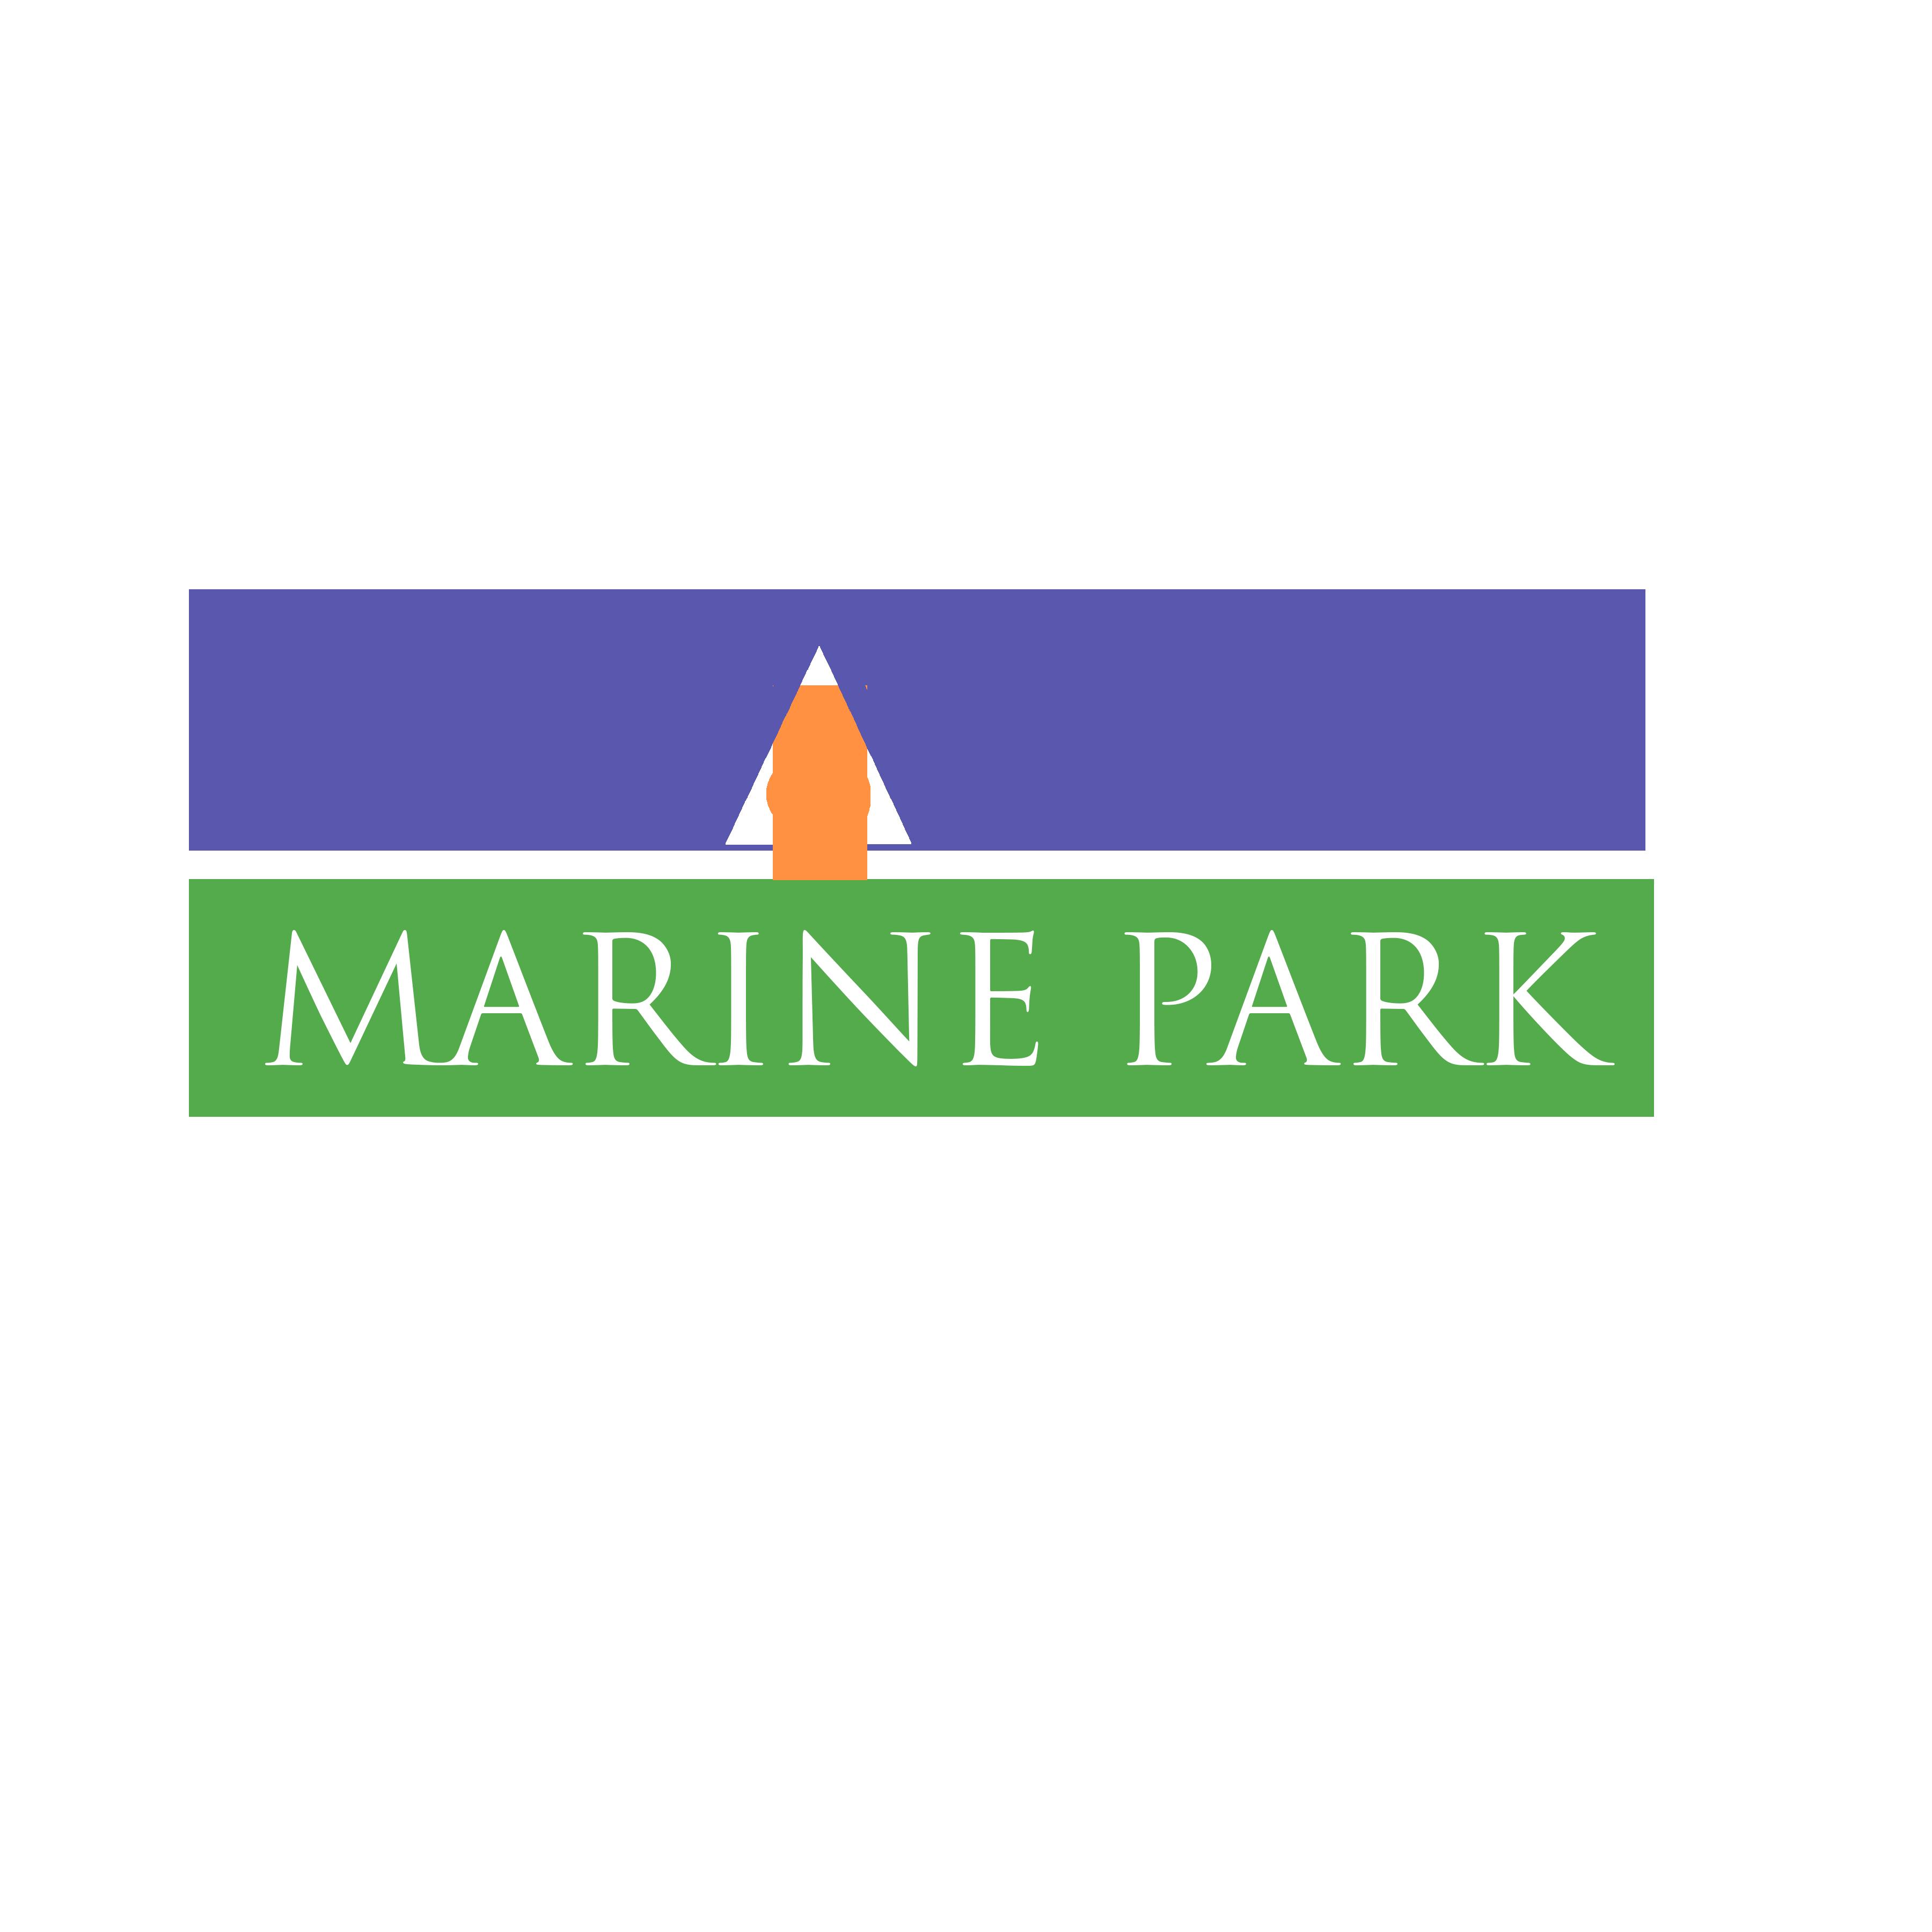 Chabad Marine Park concept